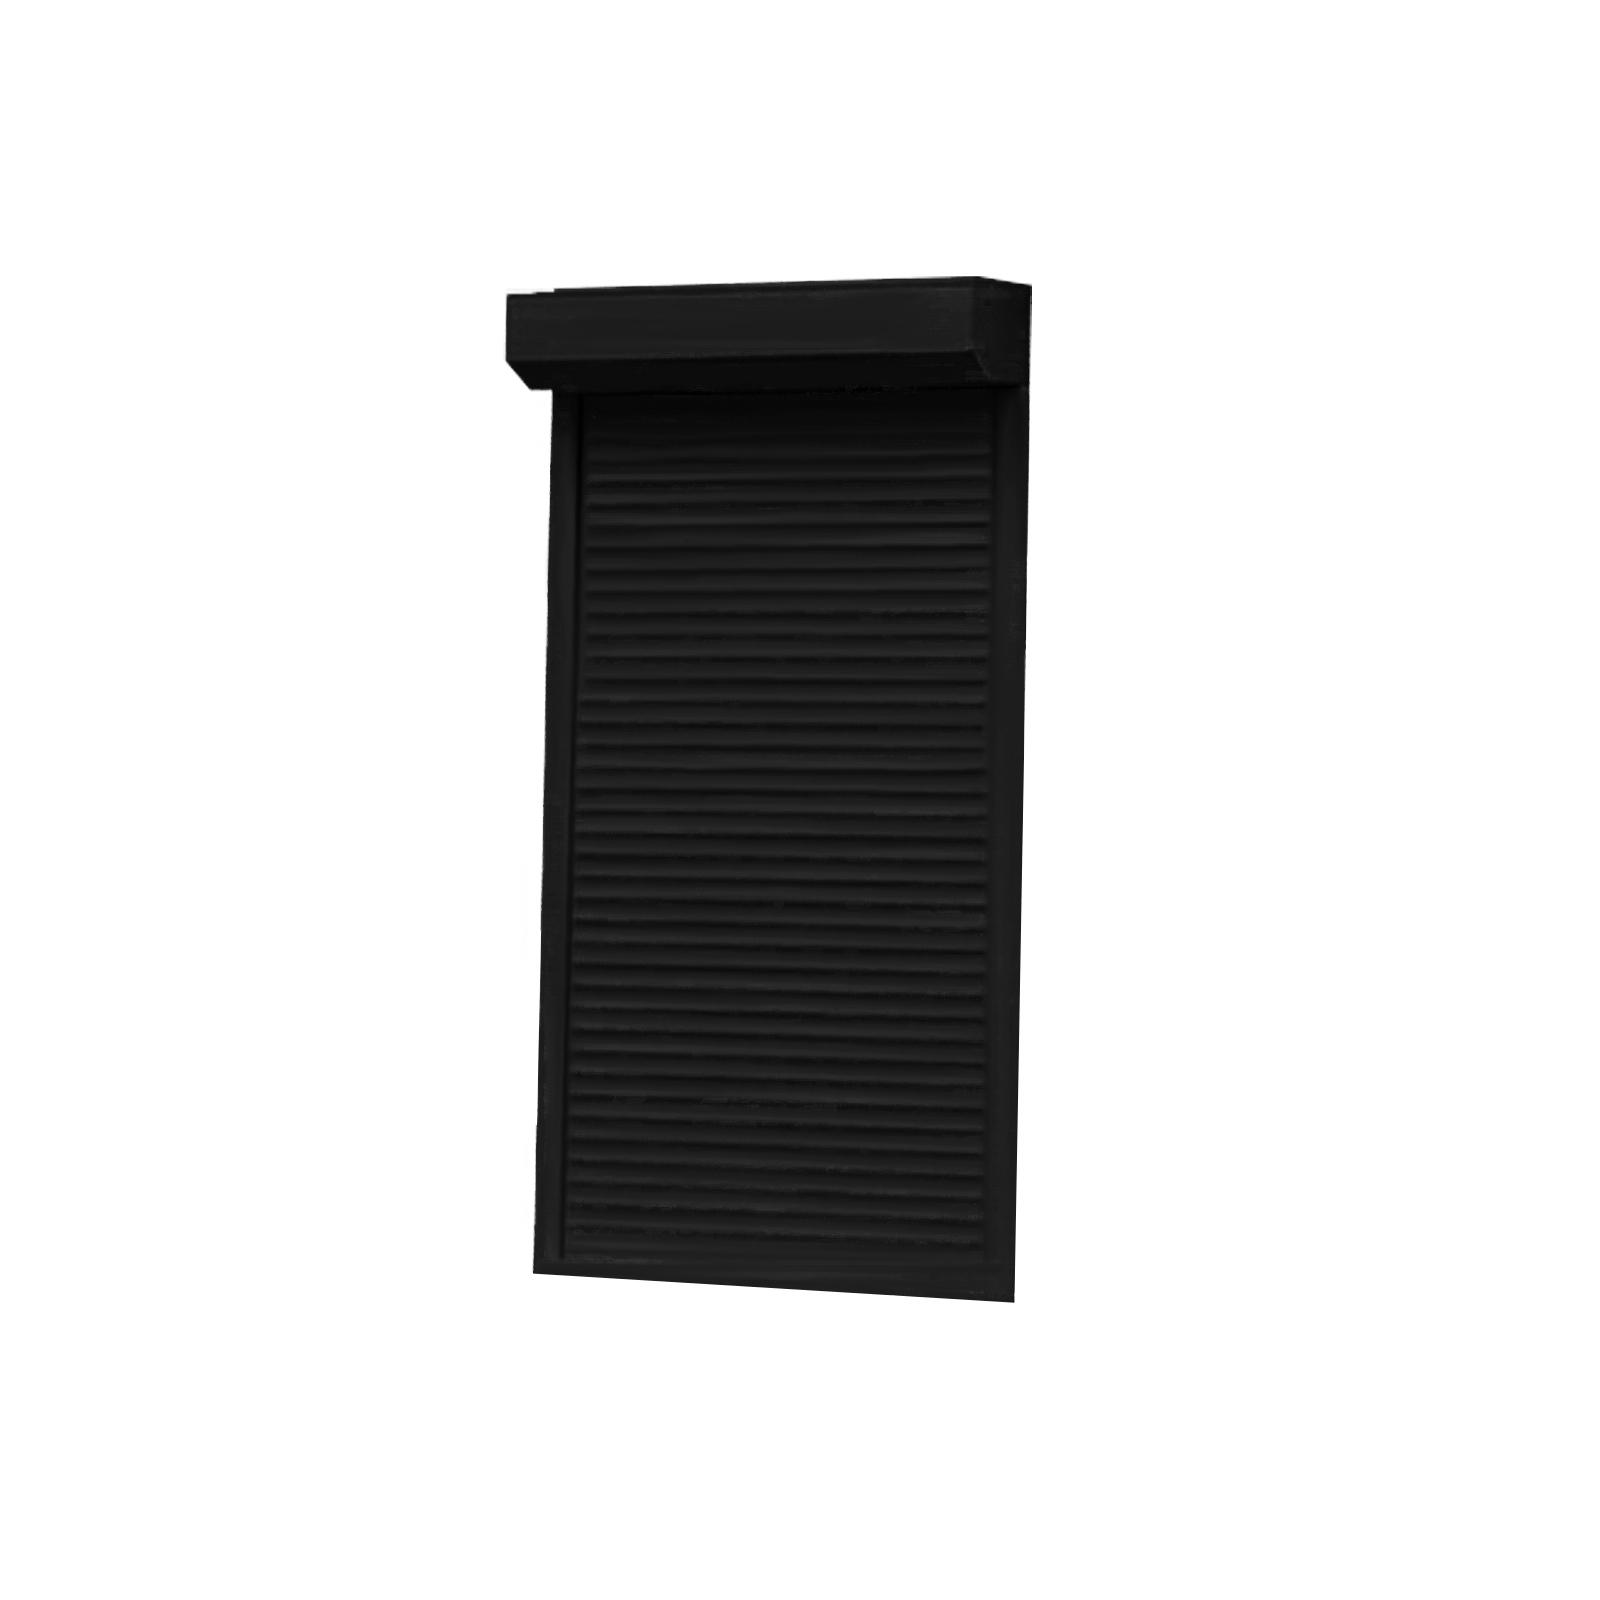 Everton 1801-2000 x 1601-1800mm On-Wall Hardwired Roller Shutter